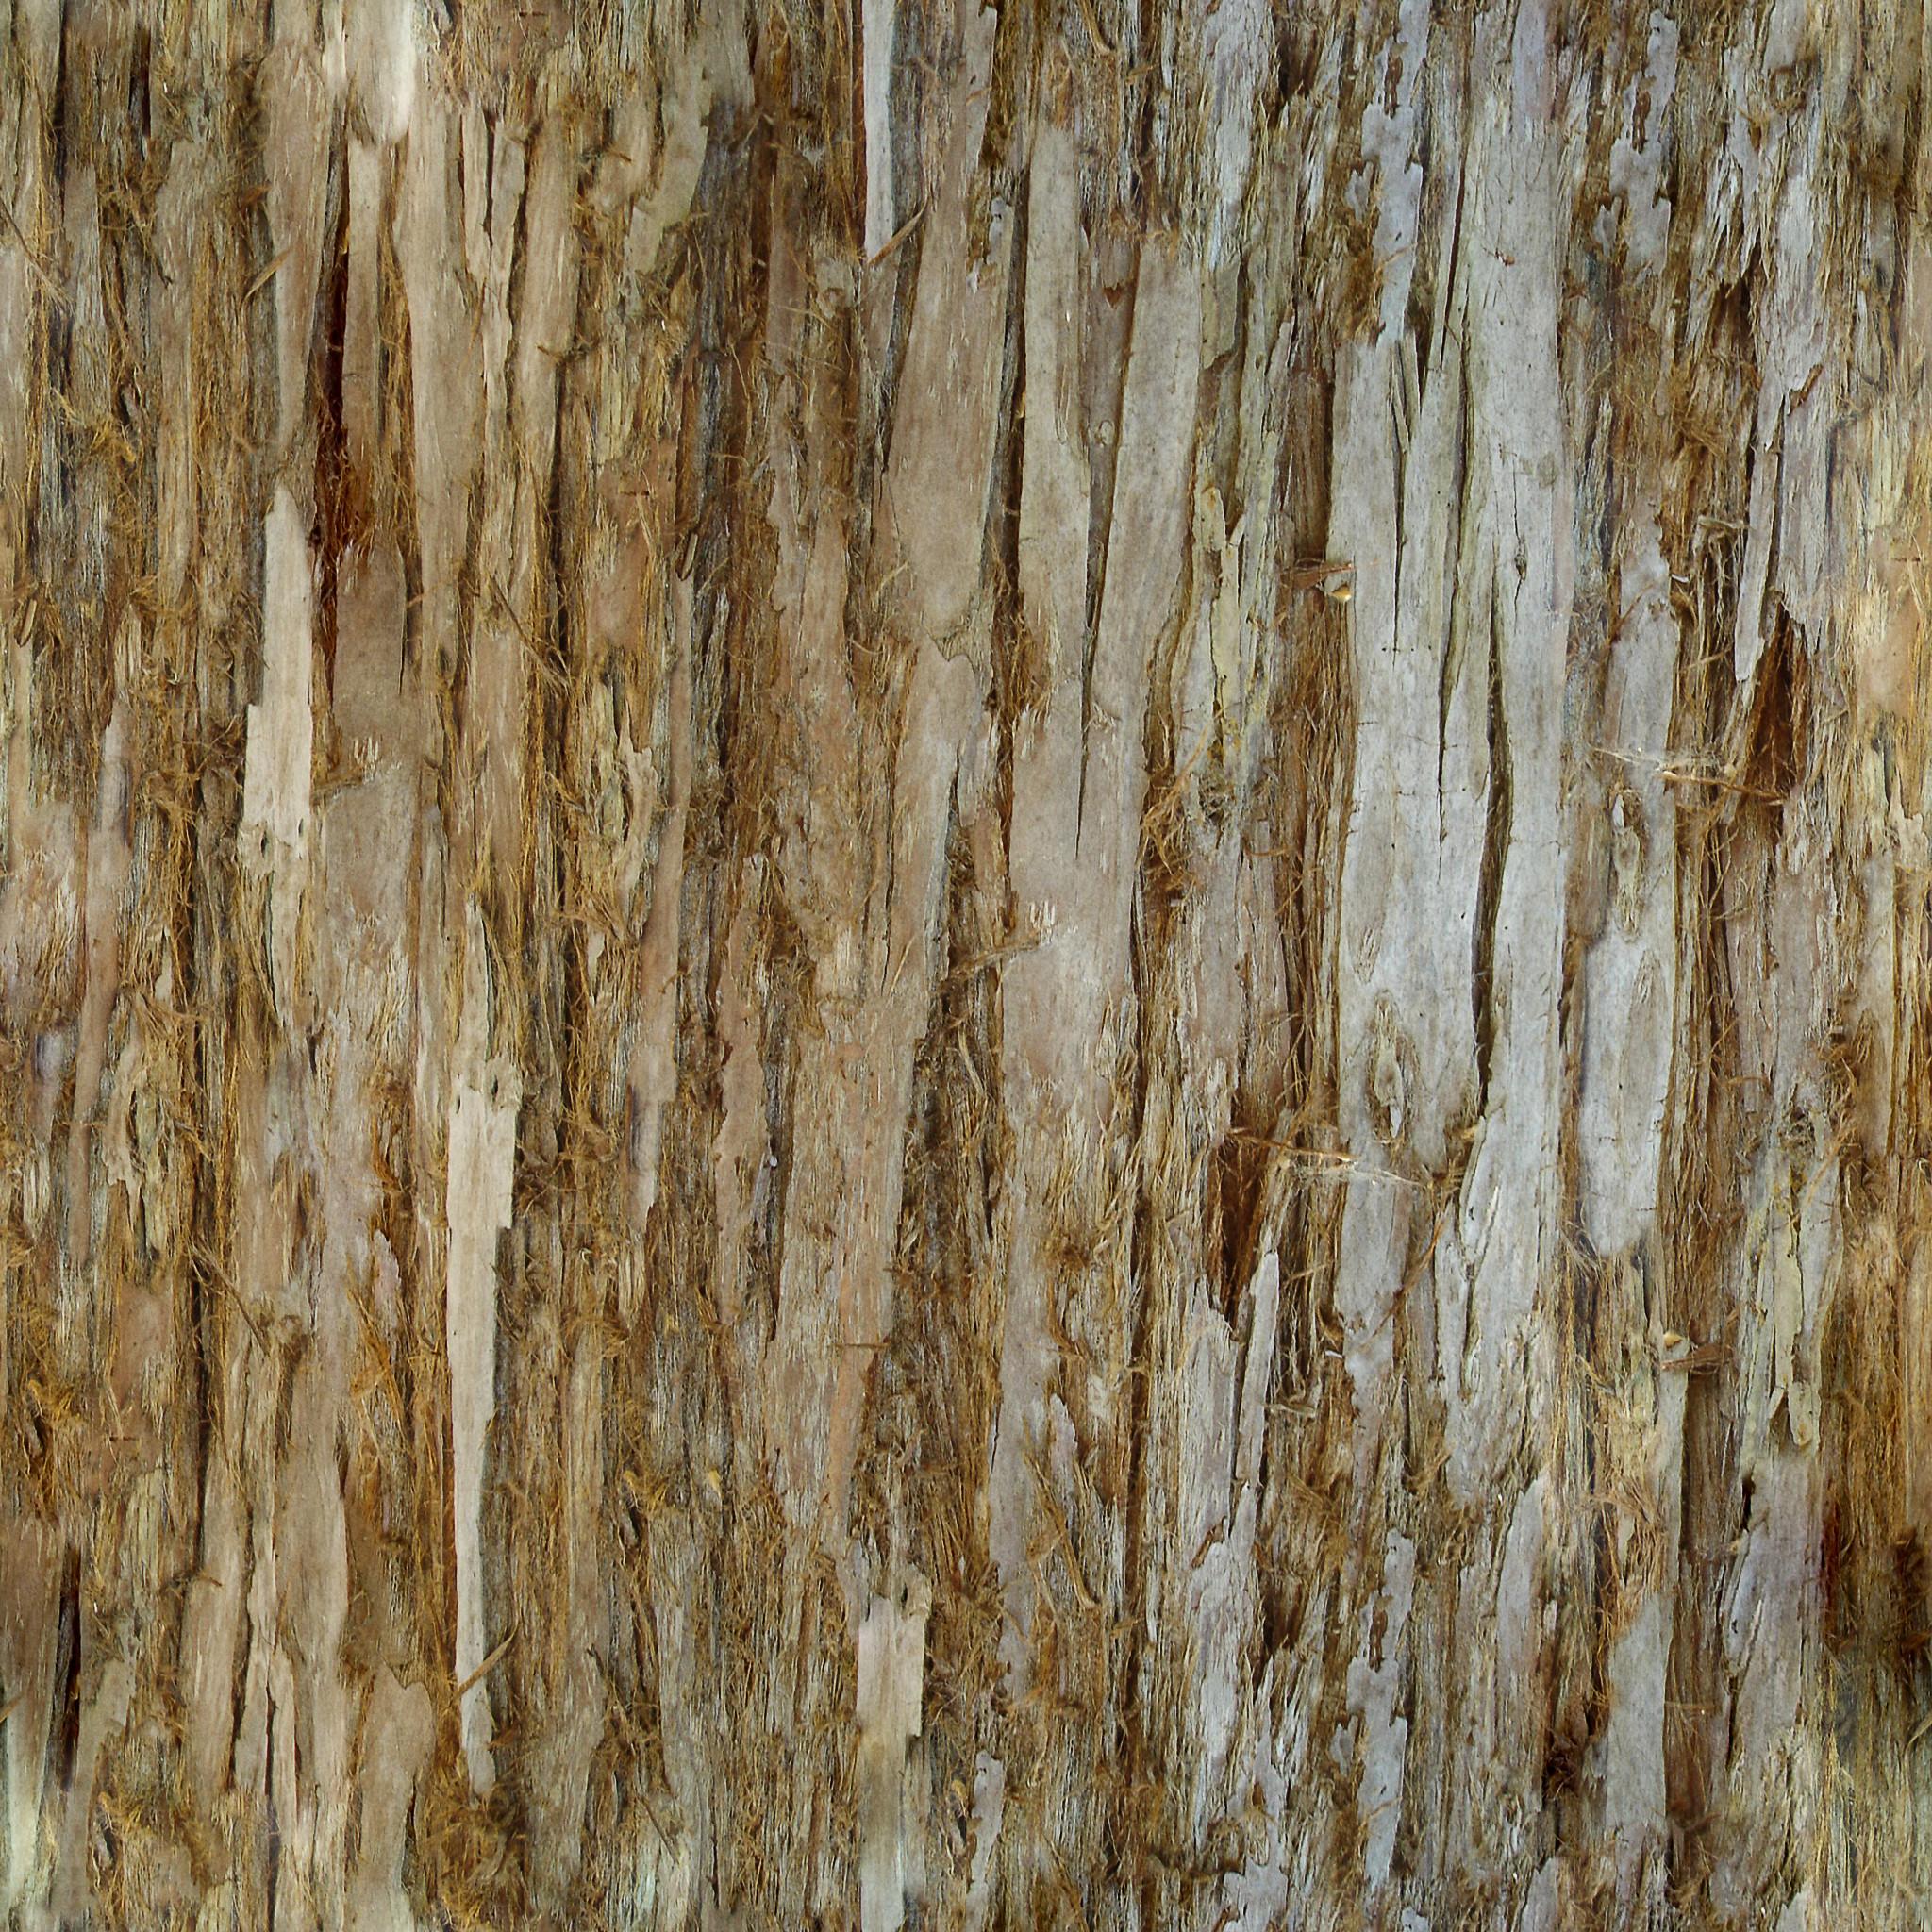 Bark texture photo